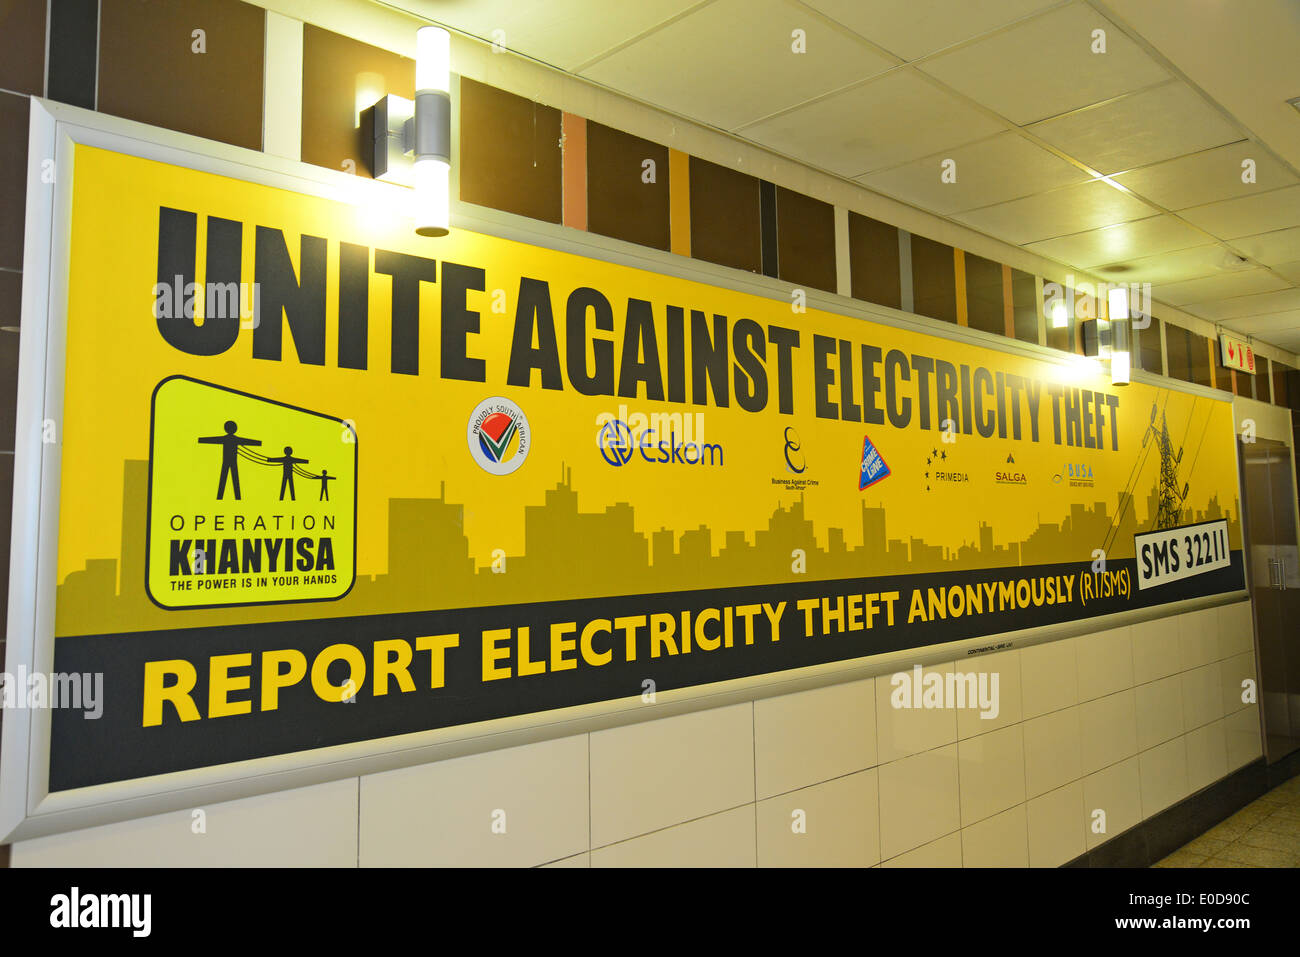 Electricity theft sign, Rhodesfield Gautrain Station